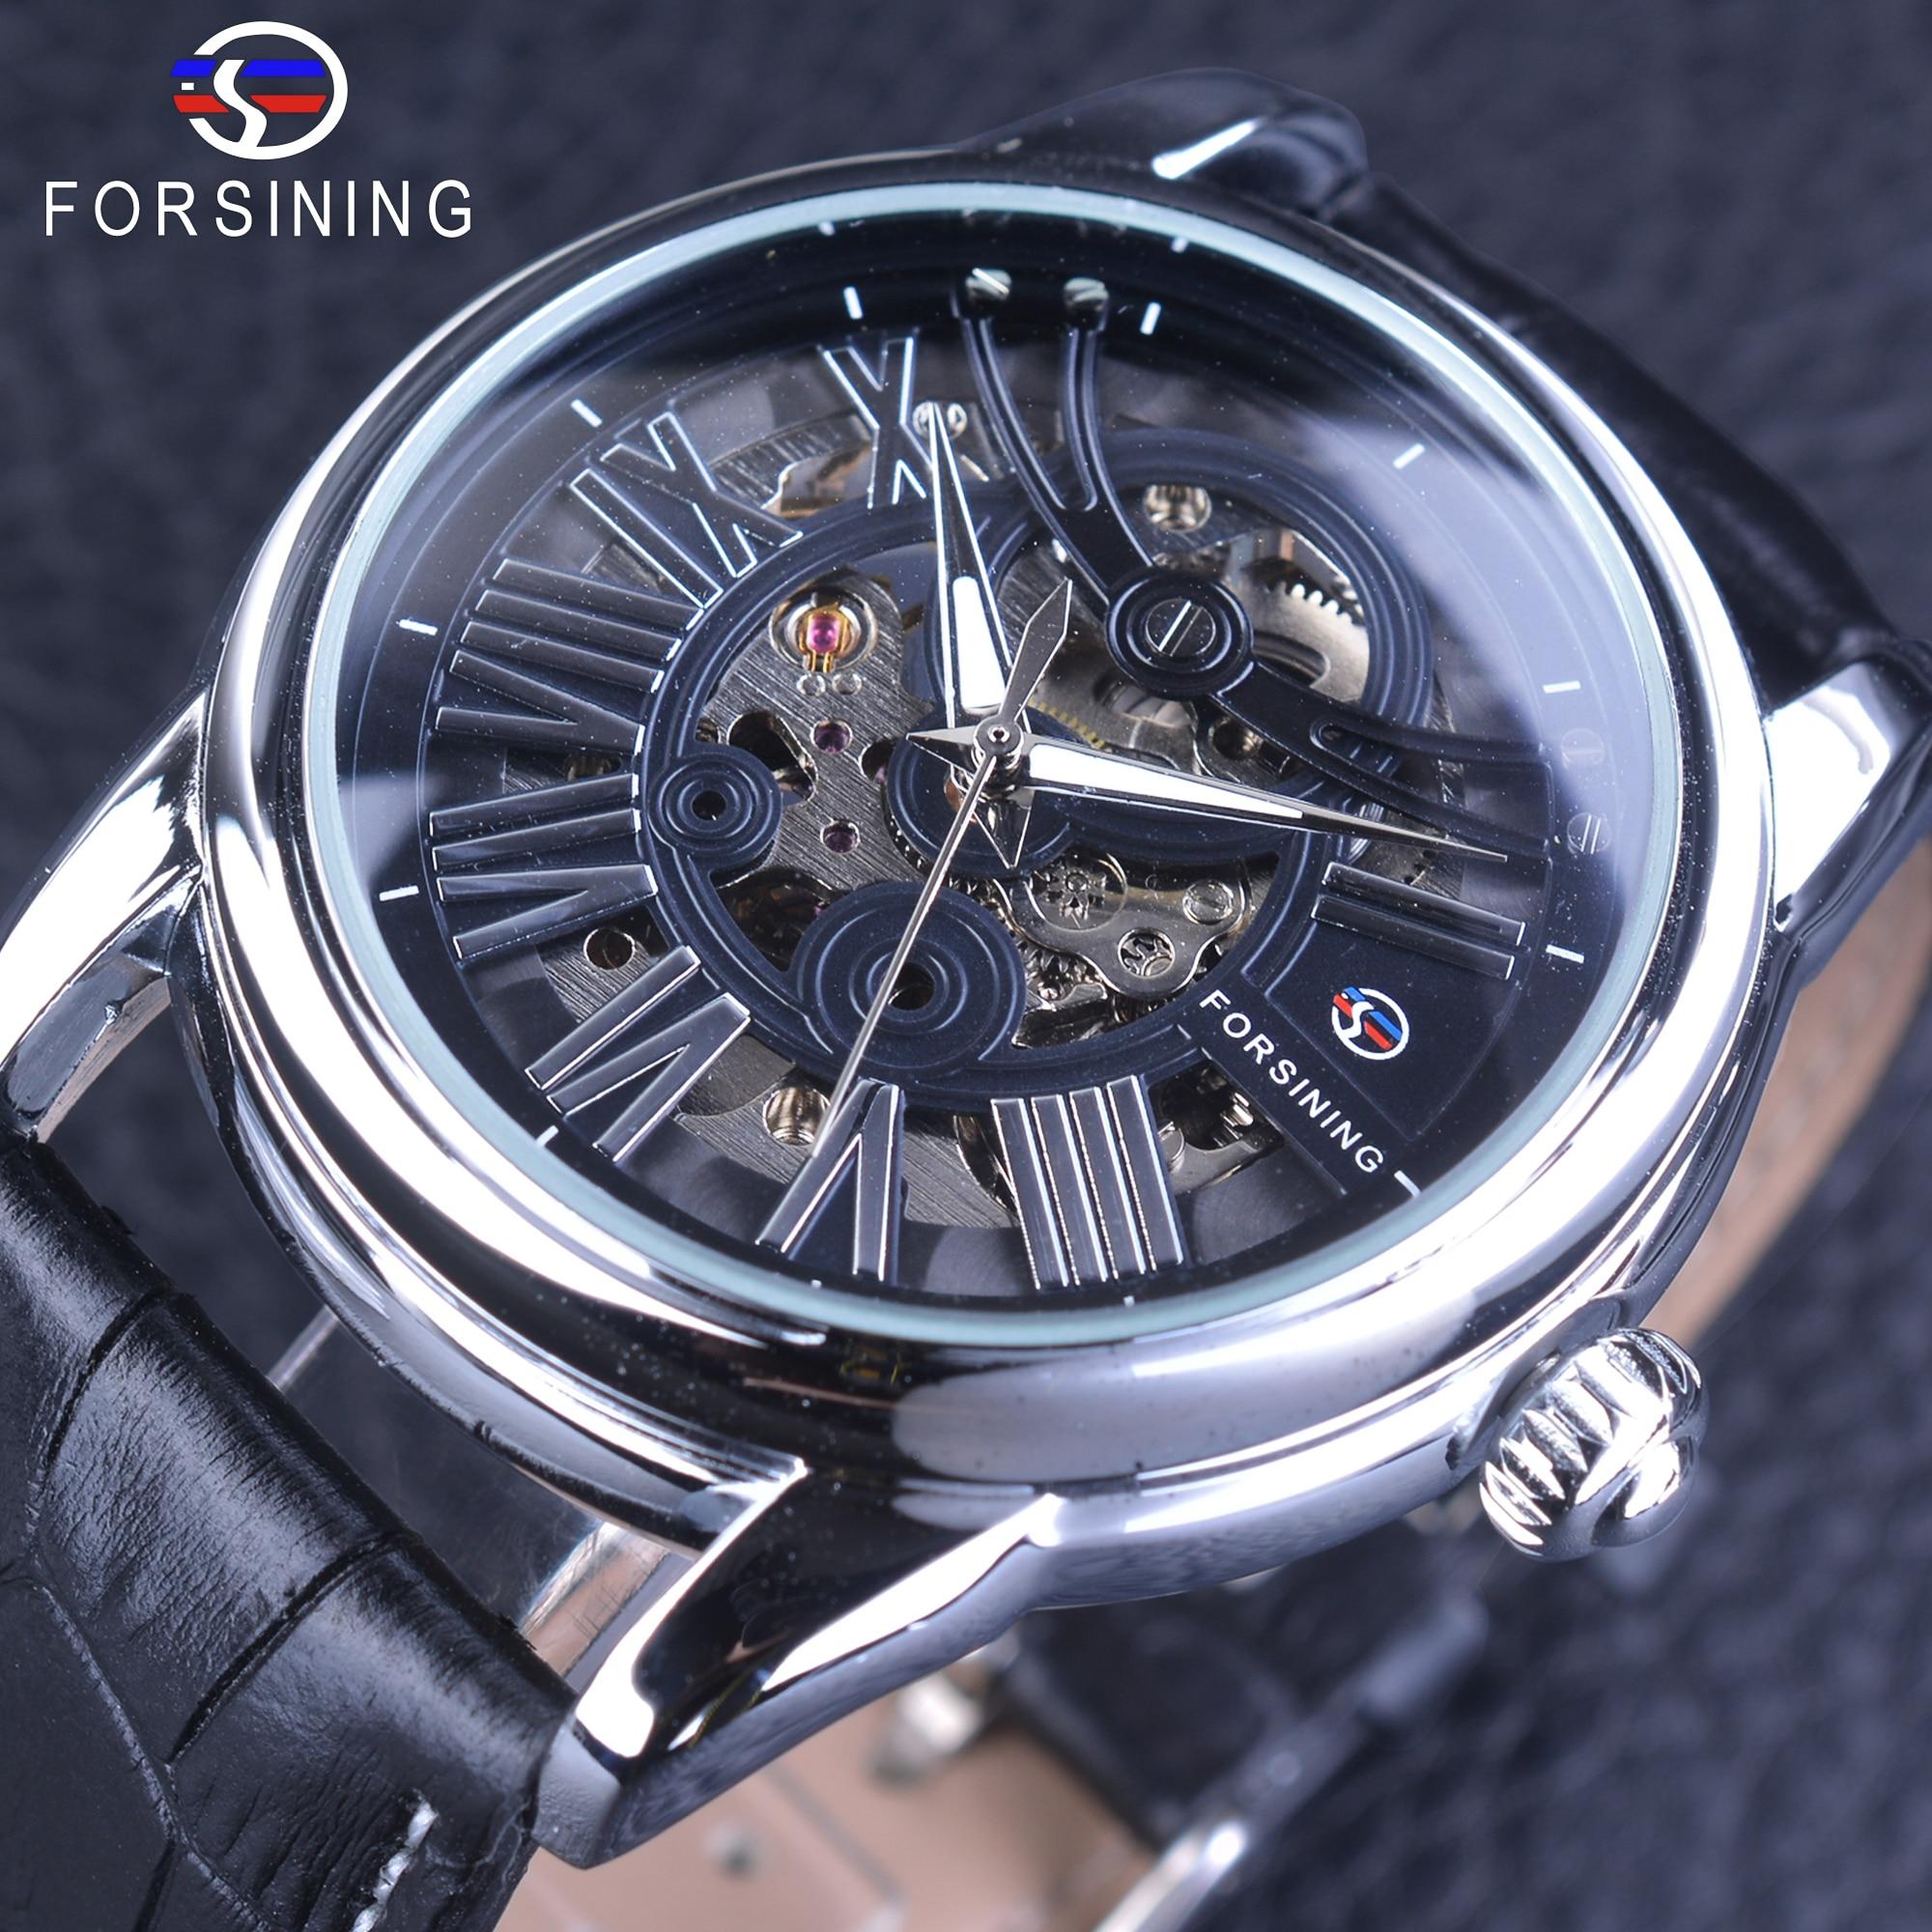 Forsining Official Exclusive Sale Roman European Retro Wave Design Classic Transparent Men's Automatic Watches Genuine Leather